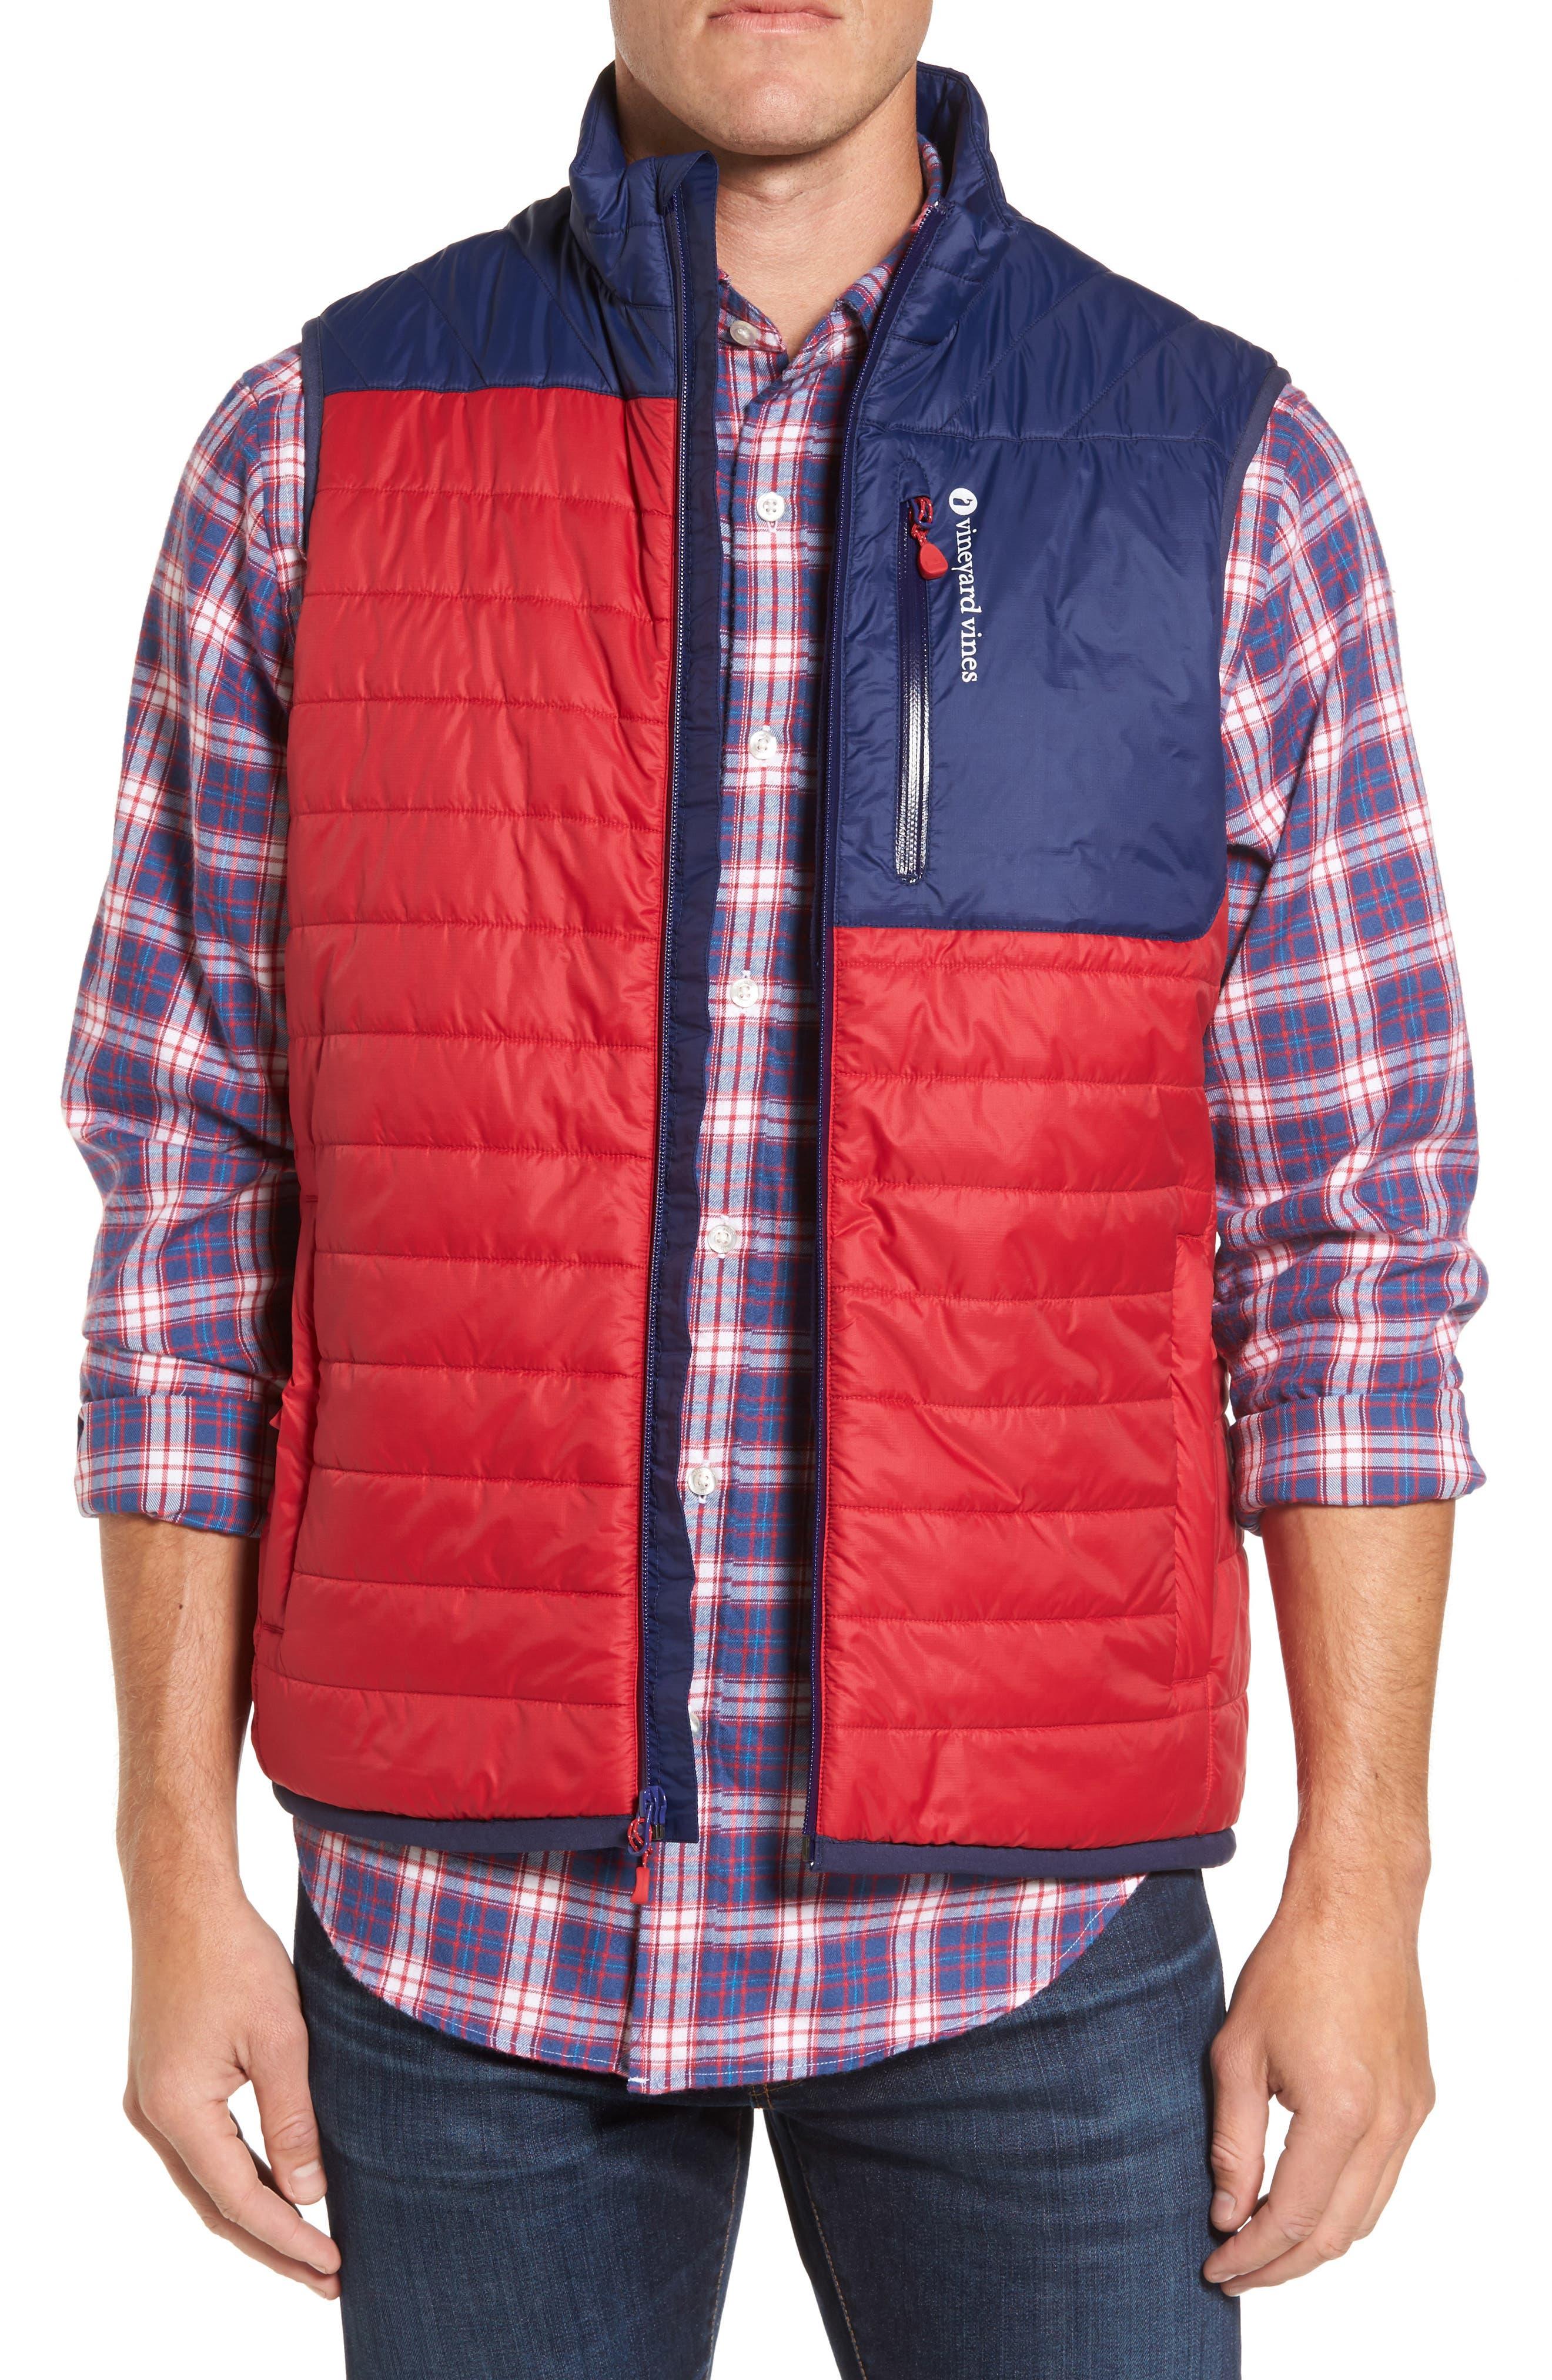 Alternate Image 1 Selected - vineyard vines Mountain Weekend Colorblock PrimaLoft® Vest